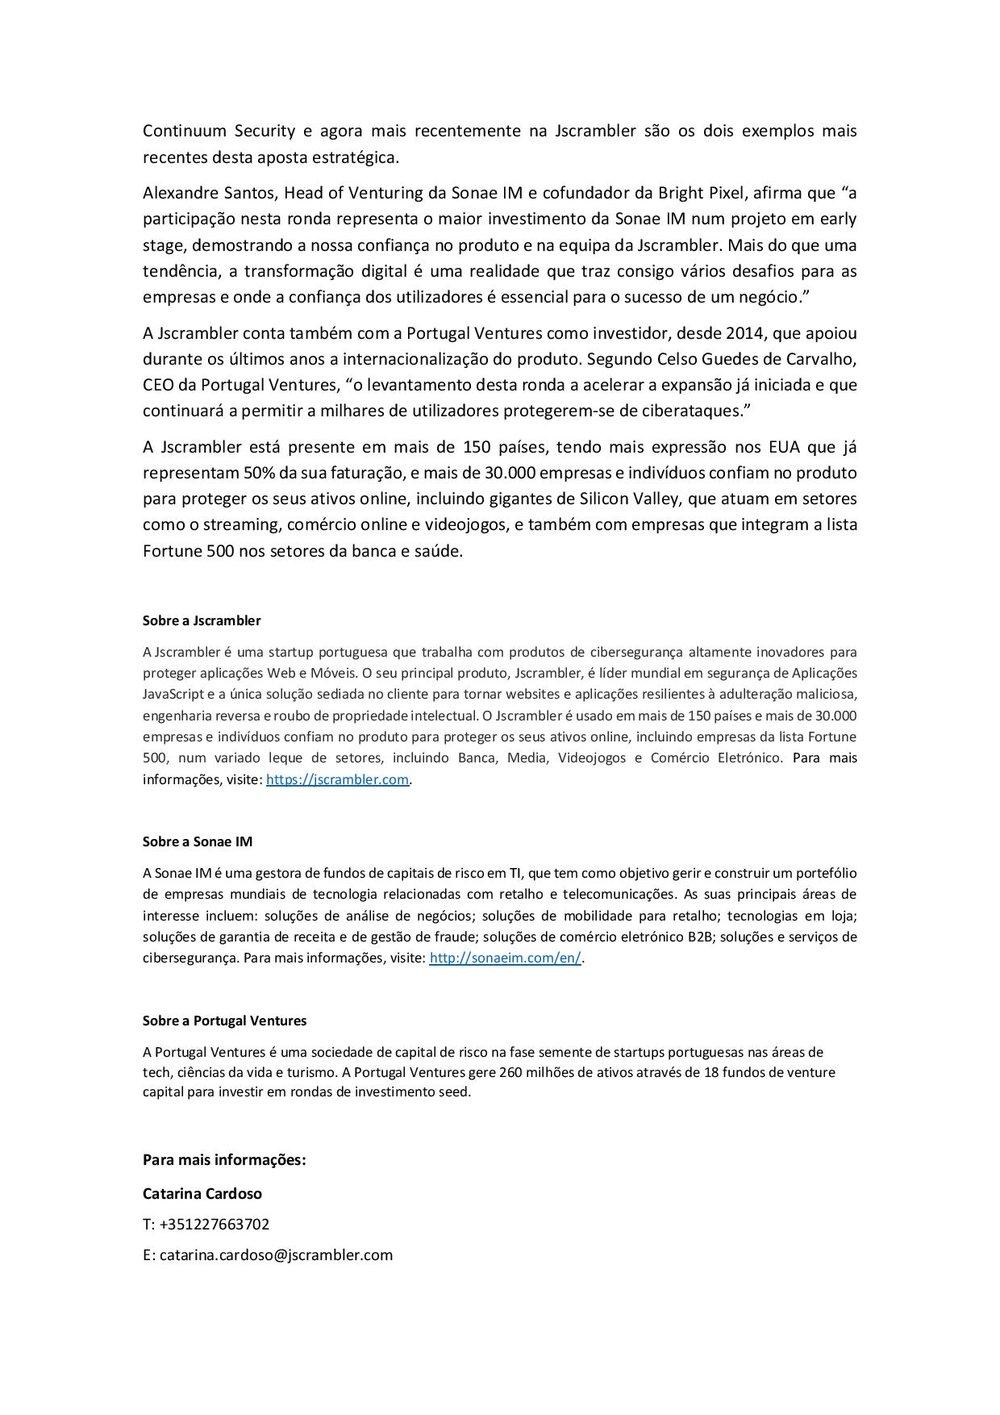 [PT] Jscrambler - PR Investimento Sonae IM-page-002.jpg